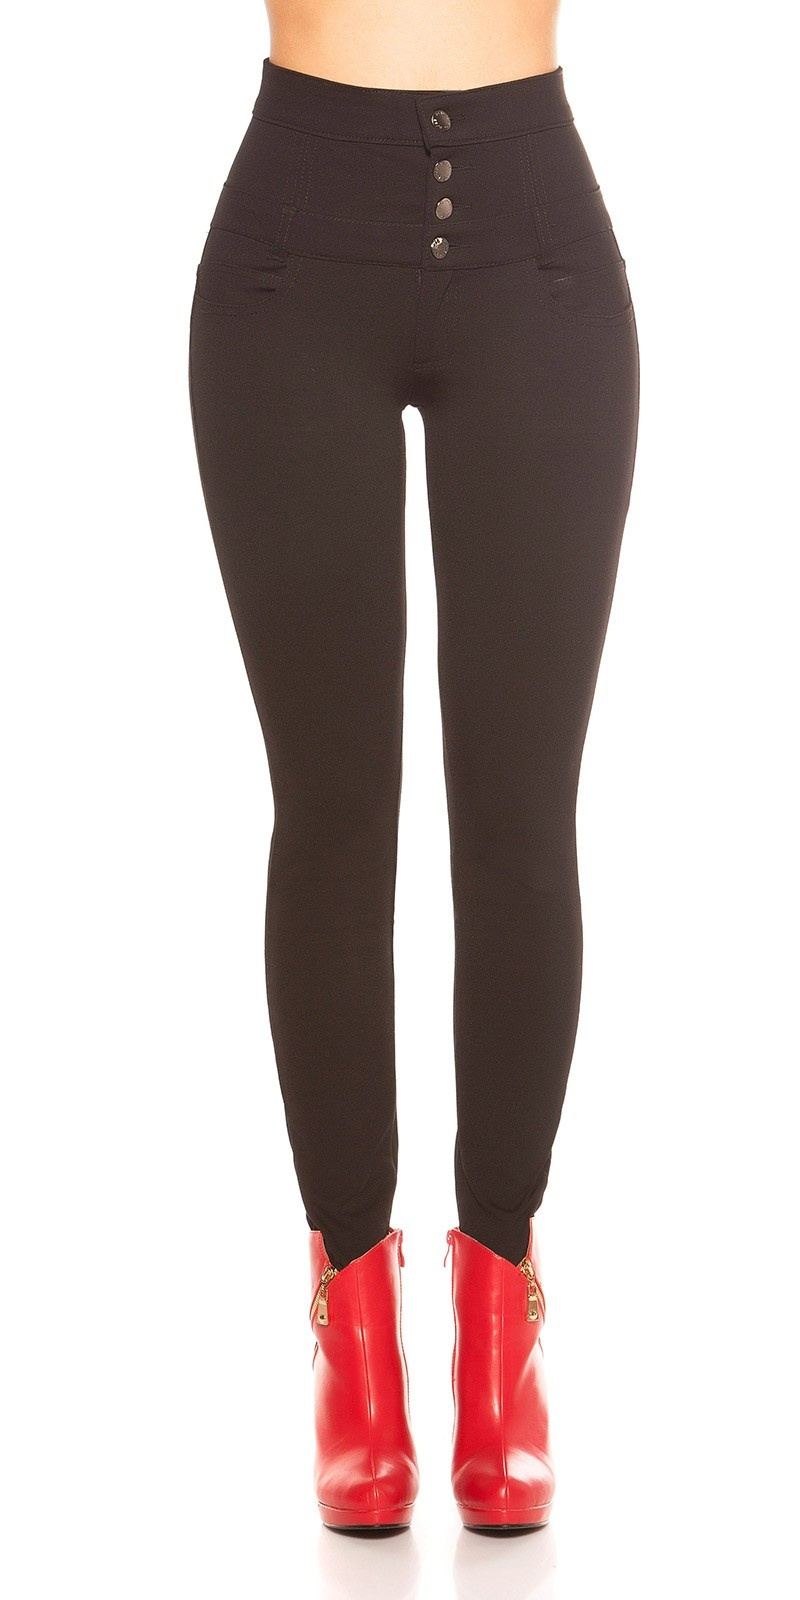 Sexy KouCla High Waist Pants Black